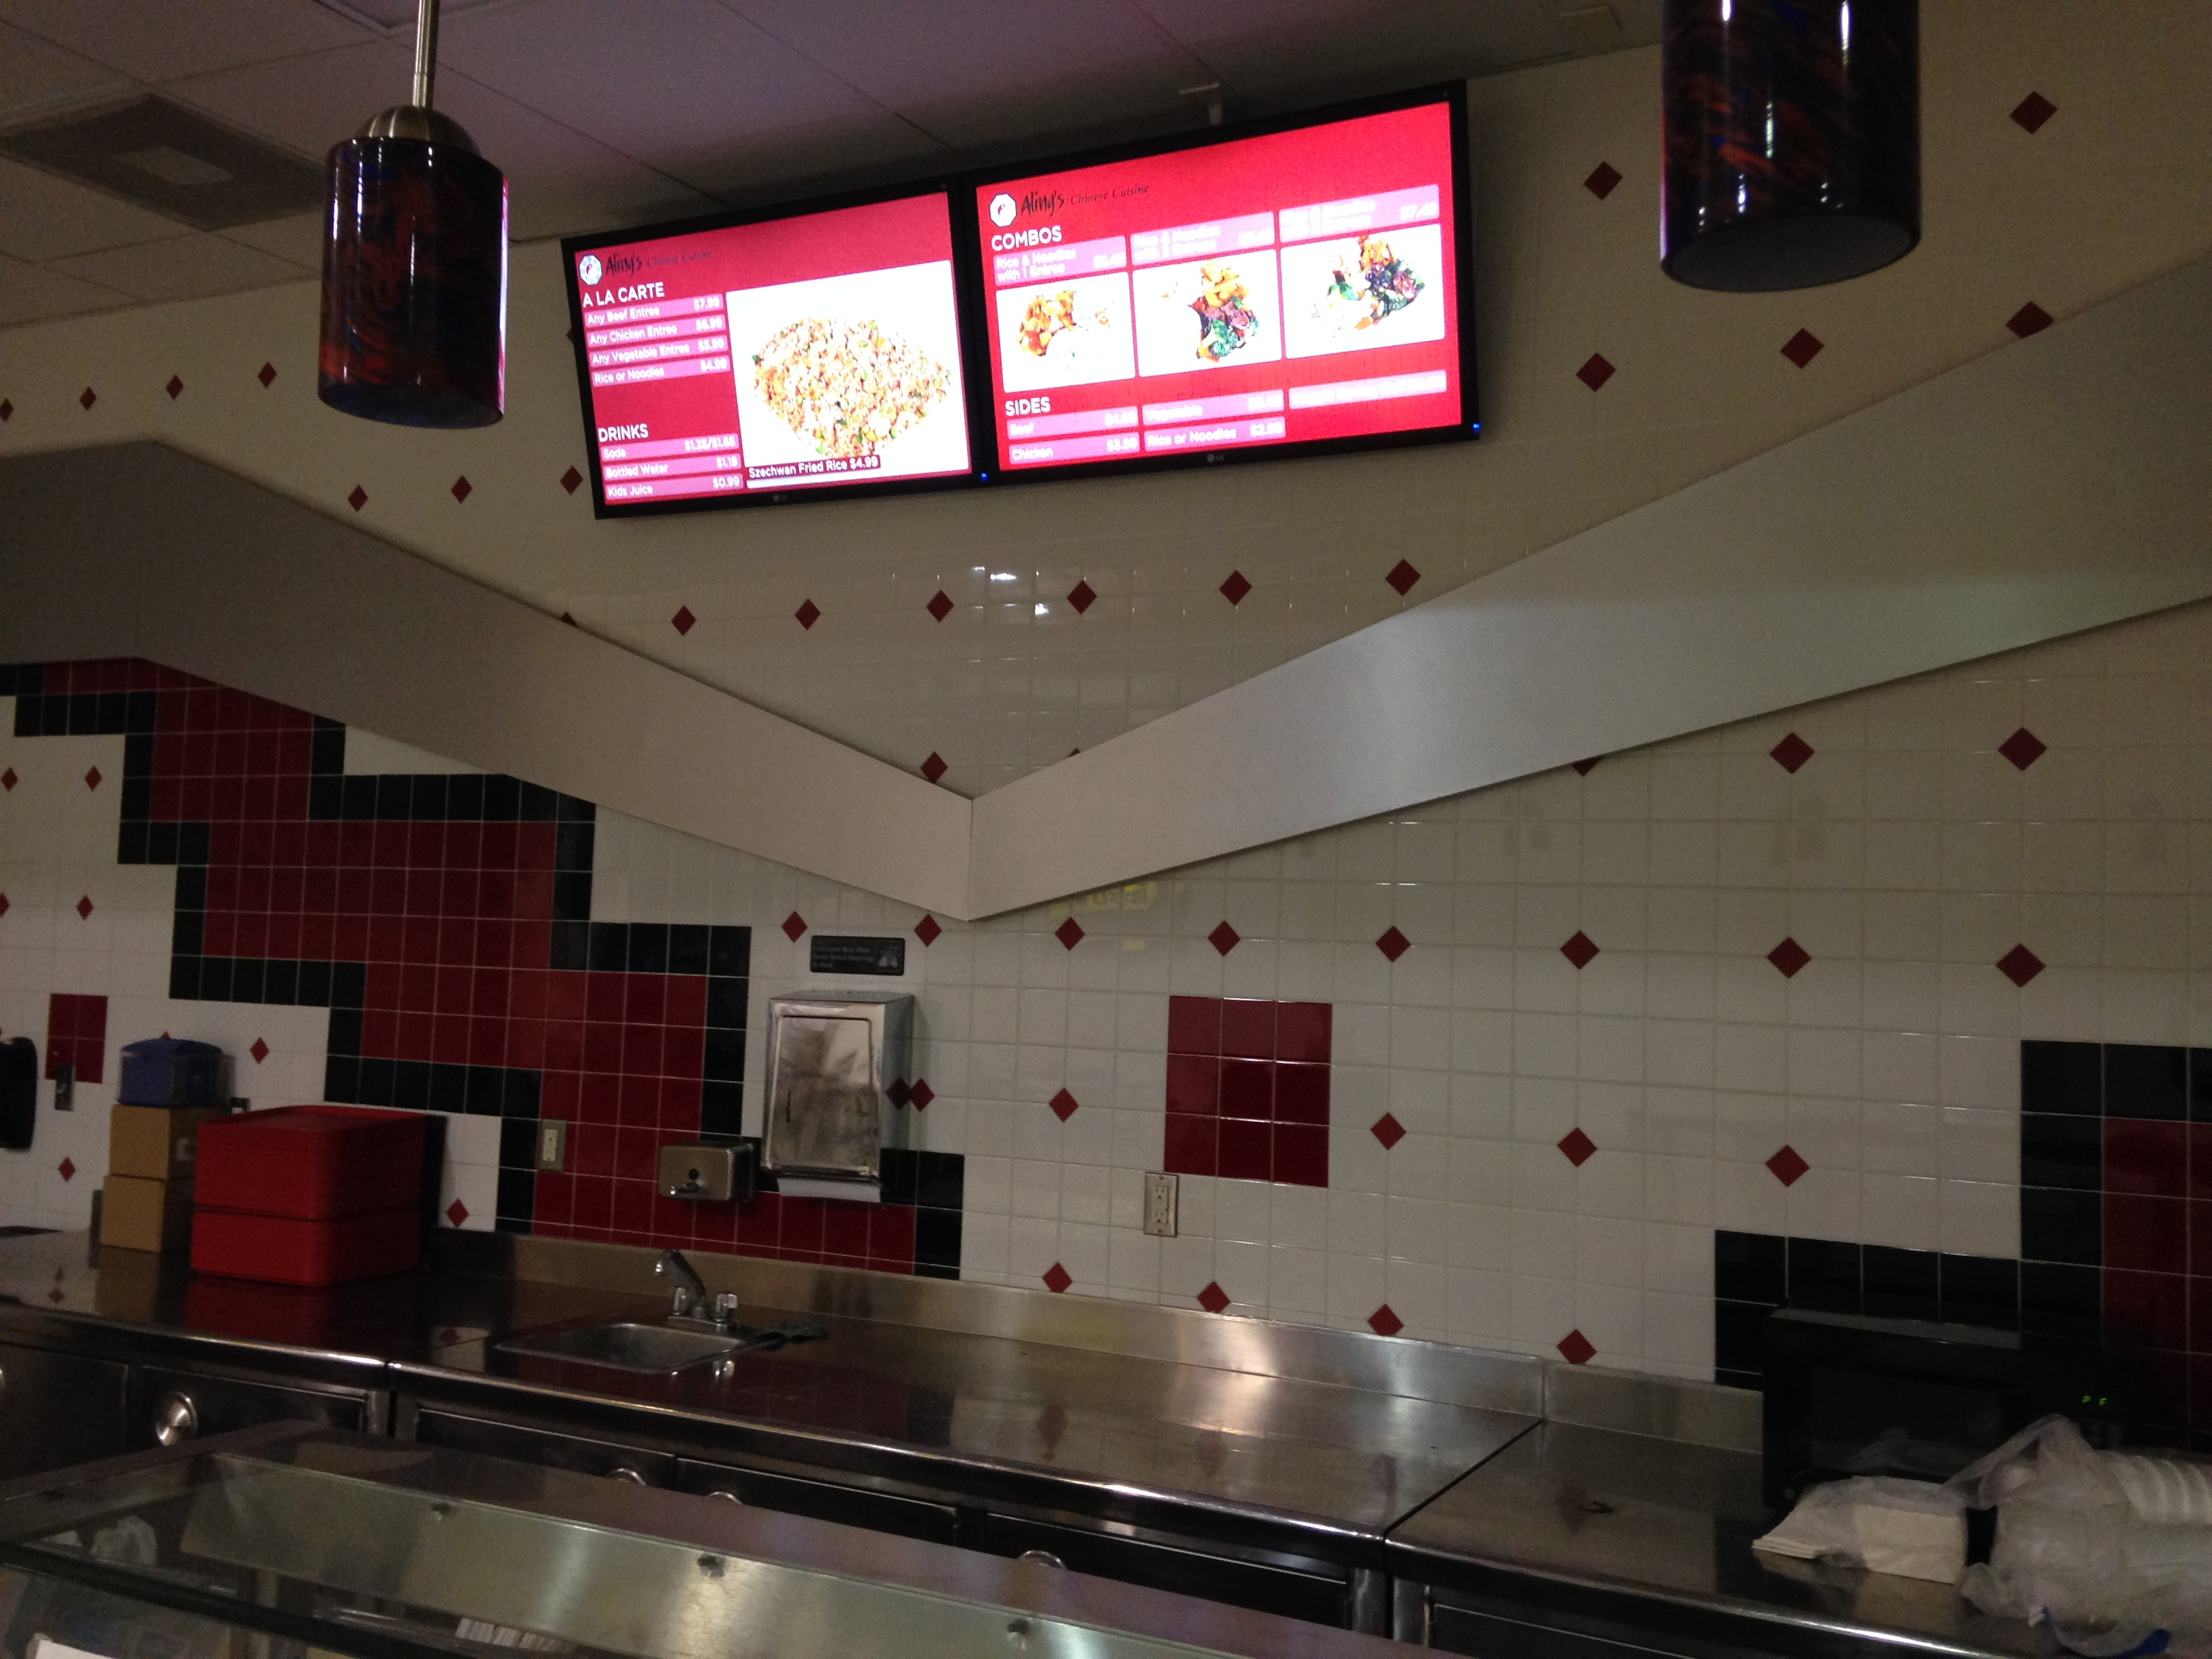 Digital Menu Board System installed at Aling's in Victoria Mall